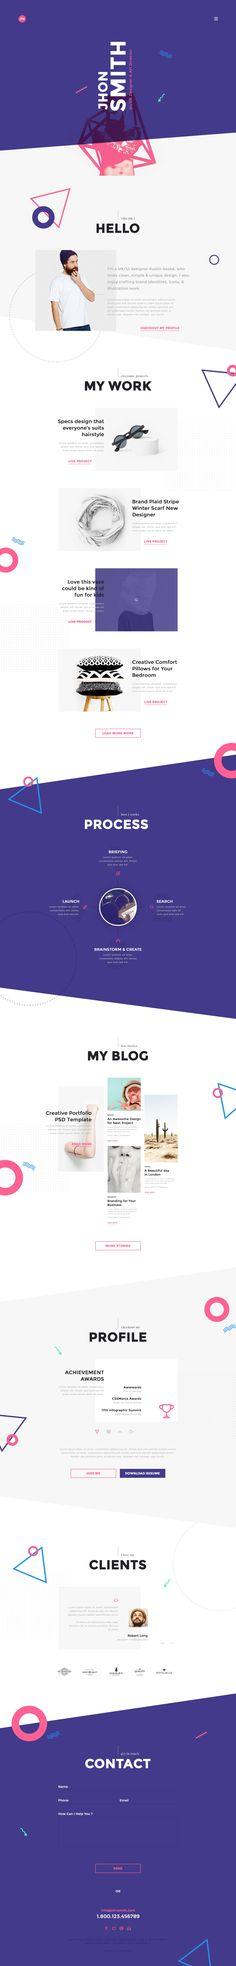 PRO - Creative Portfolio Theme #DESIGN